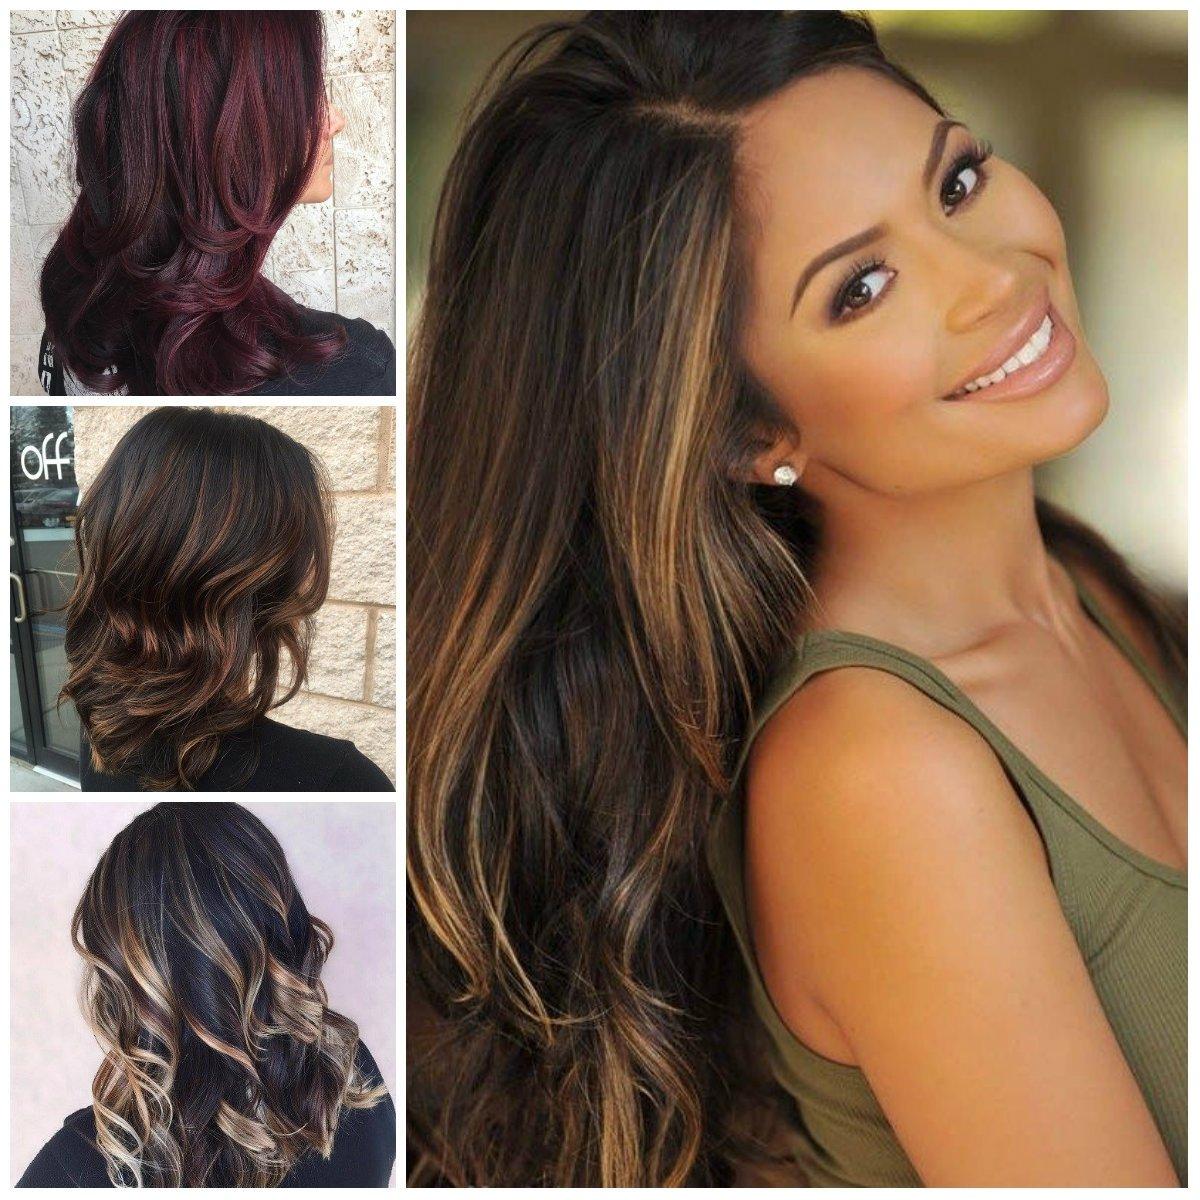 10 Famous Hair Dye Ideas For Dark Hair dark brown hair color with highlights for 2017 best hair color 1 2021